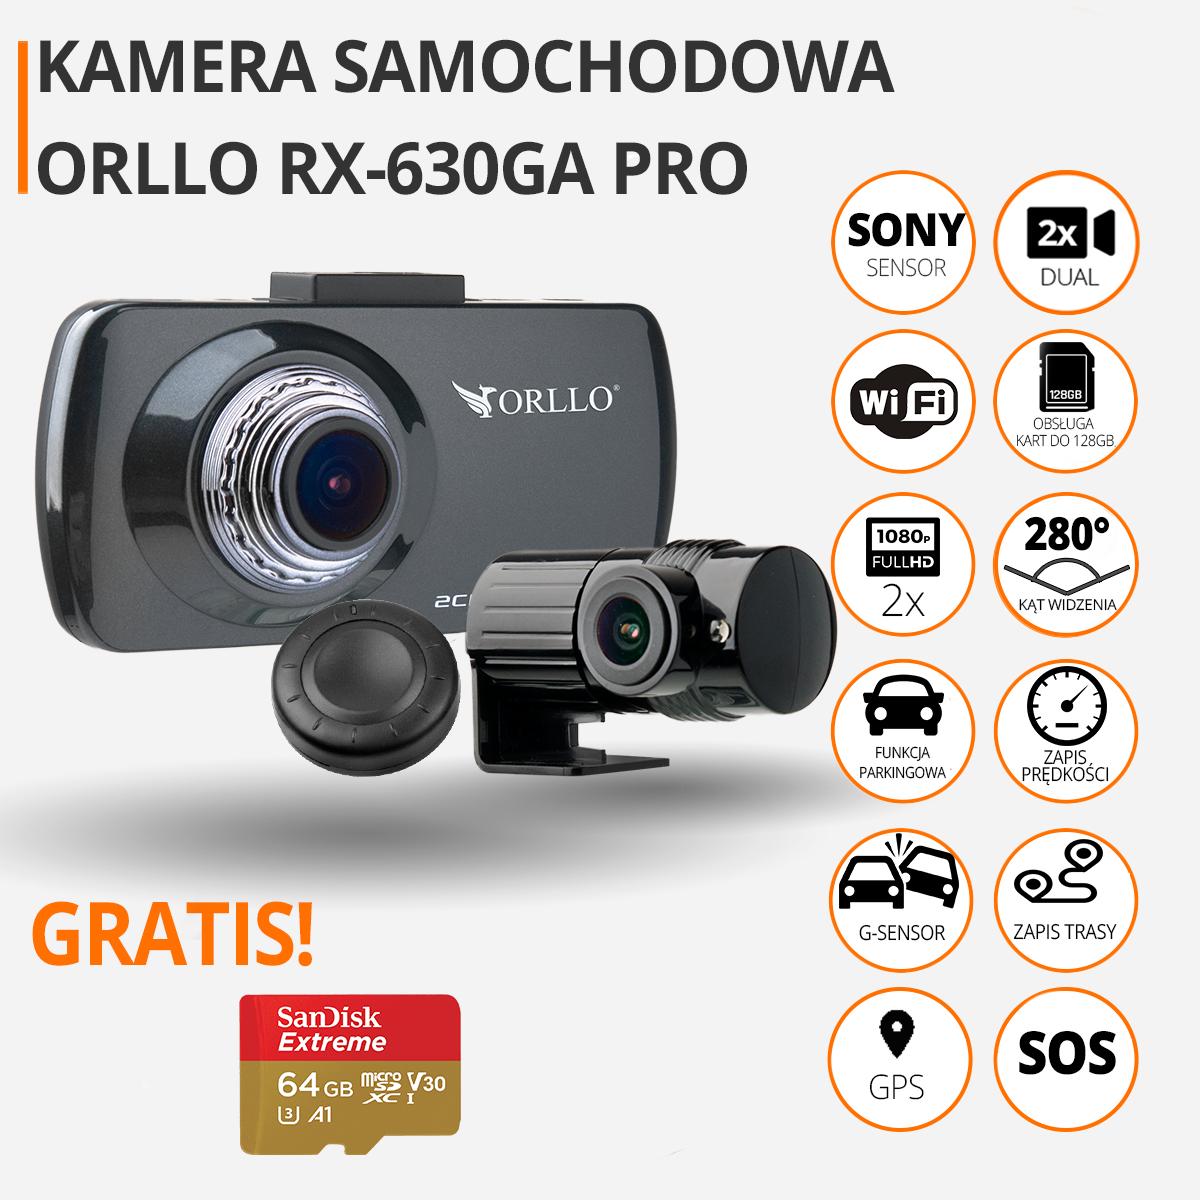 kamerka-samochodowa-Rx630-funkcje-orllo-pl